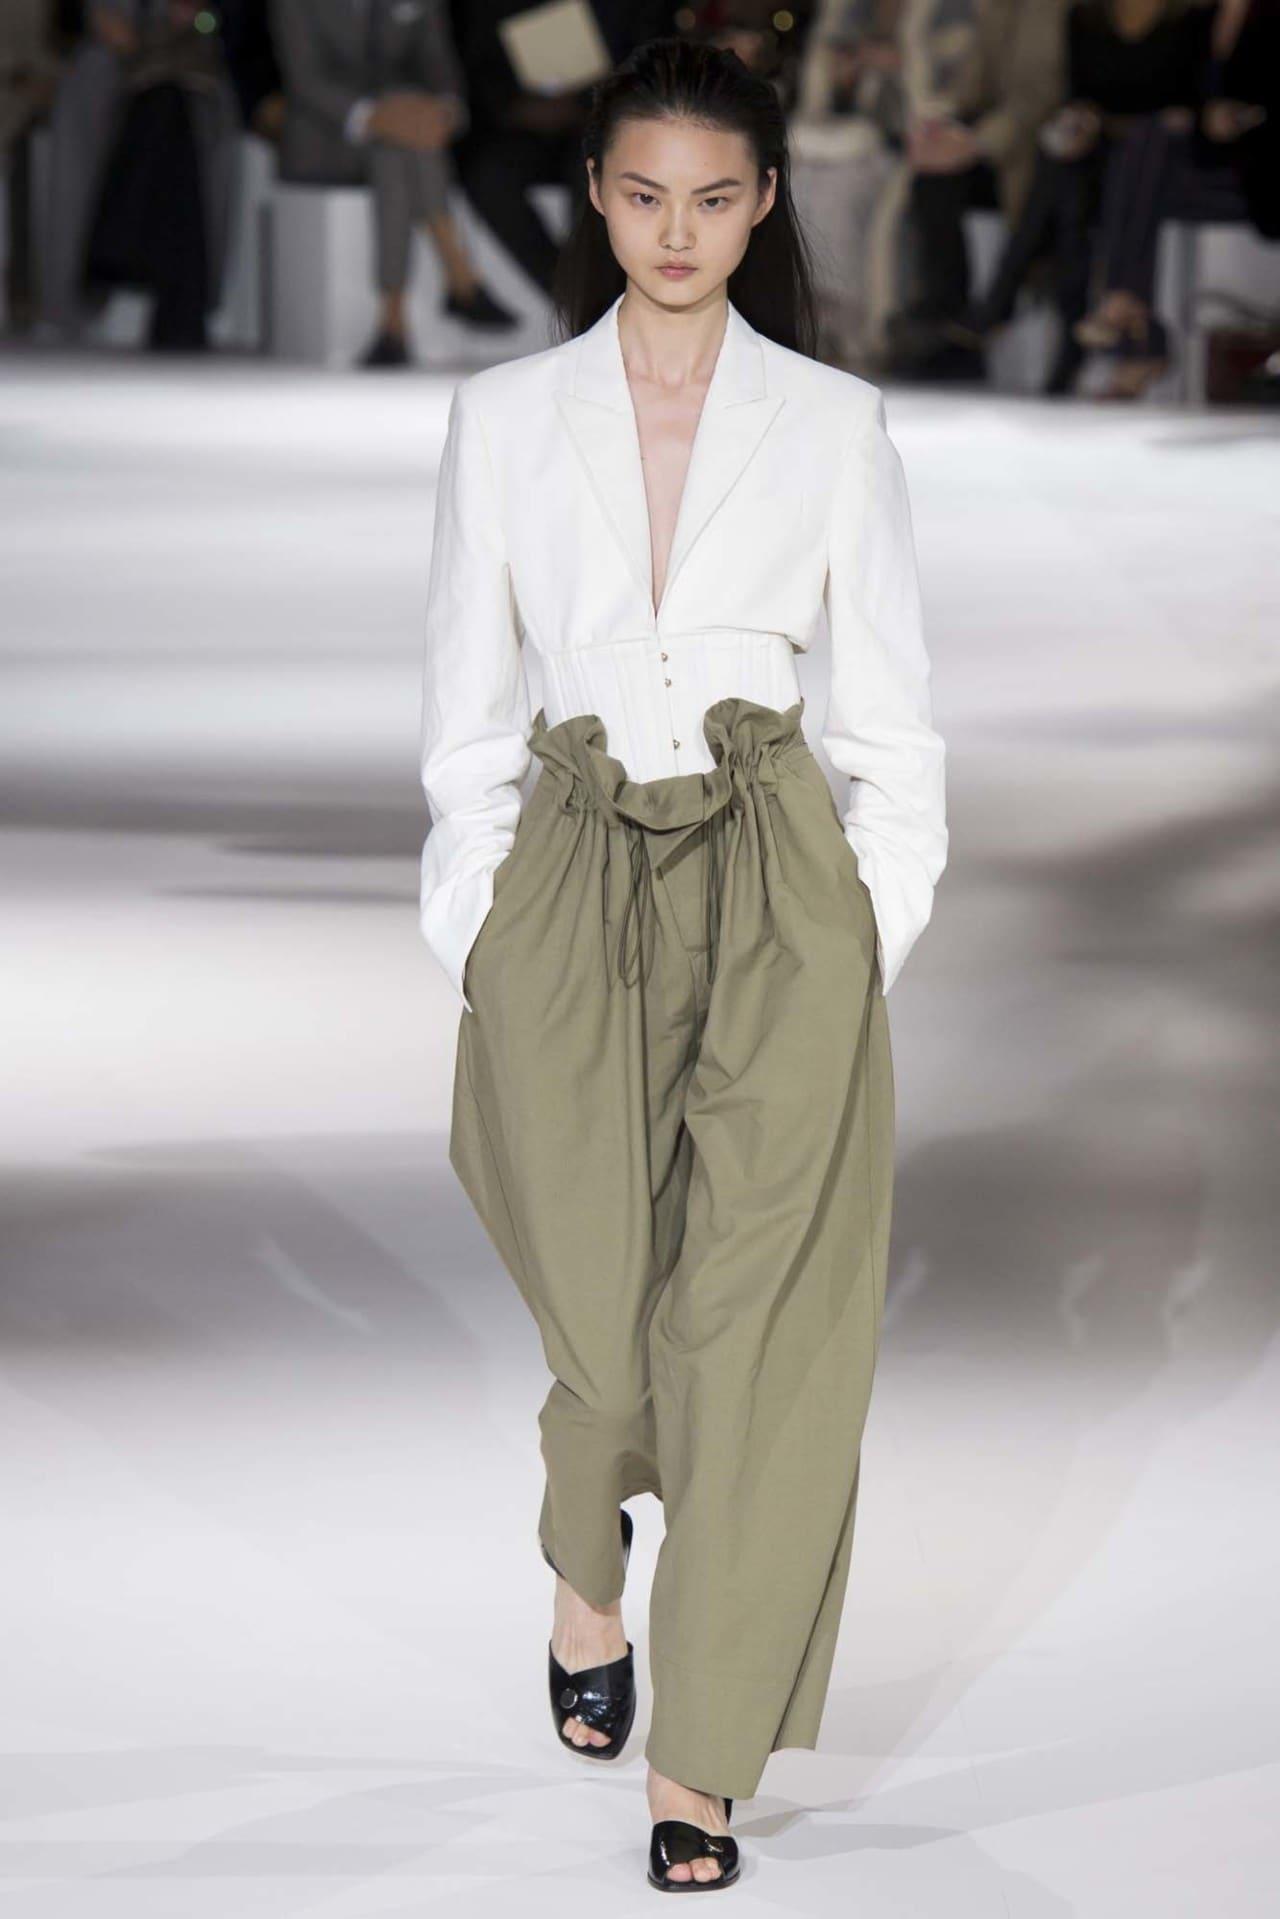 Stella McCartney ready-to-wear spring/summer '17